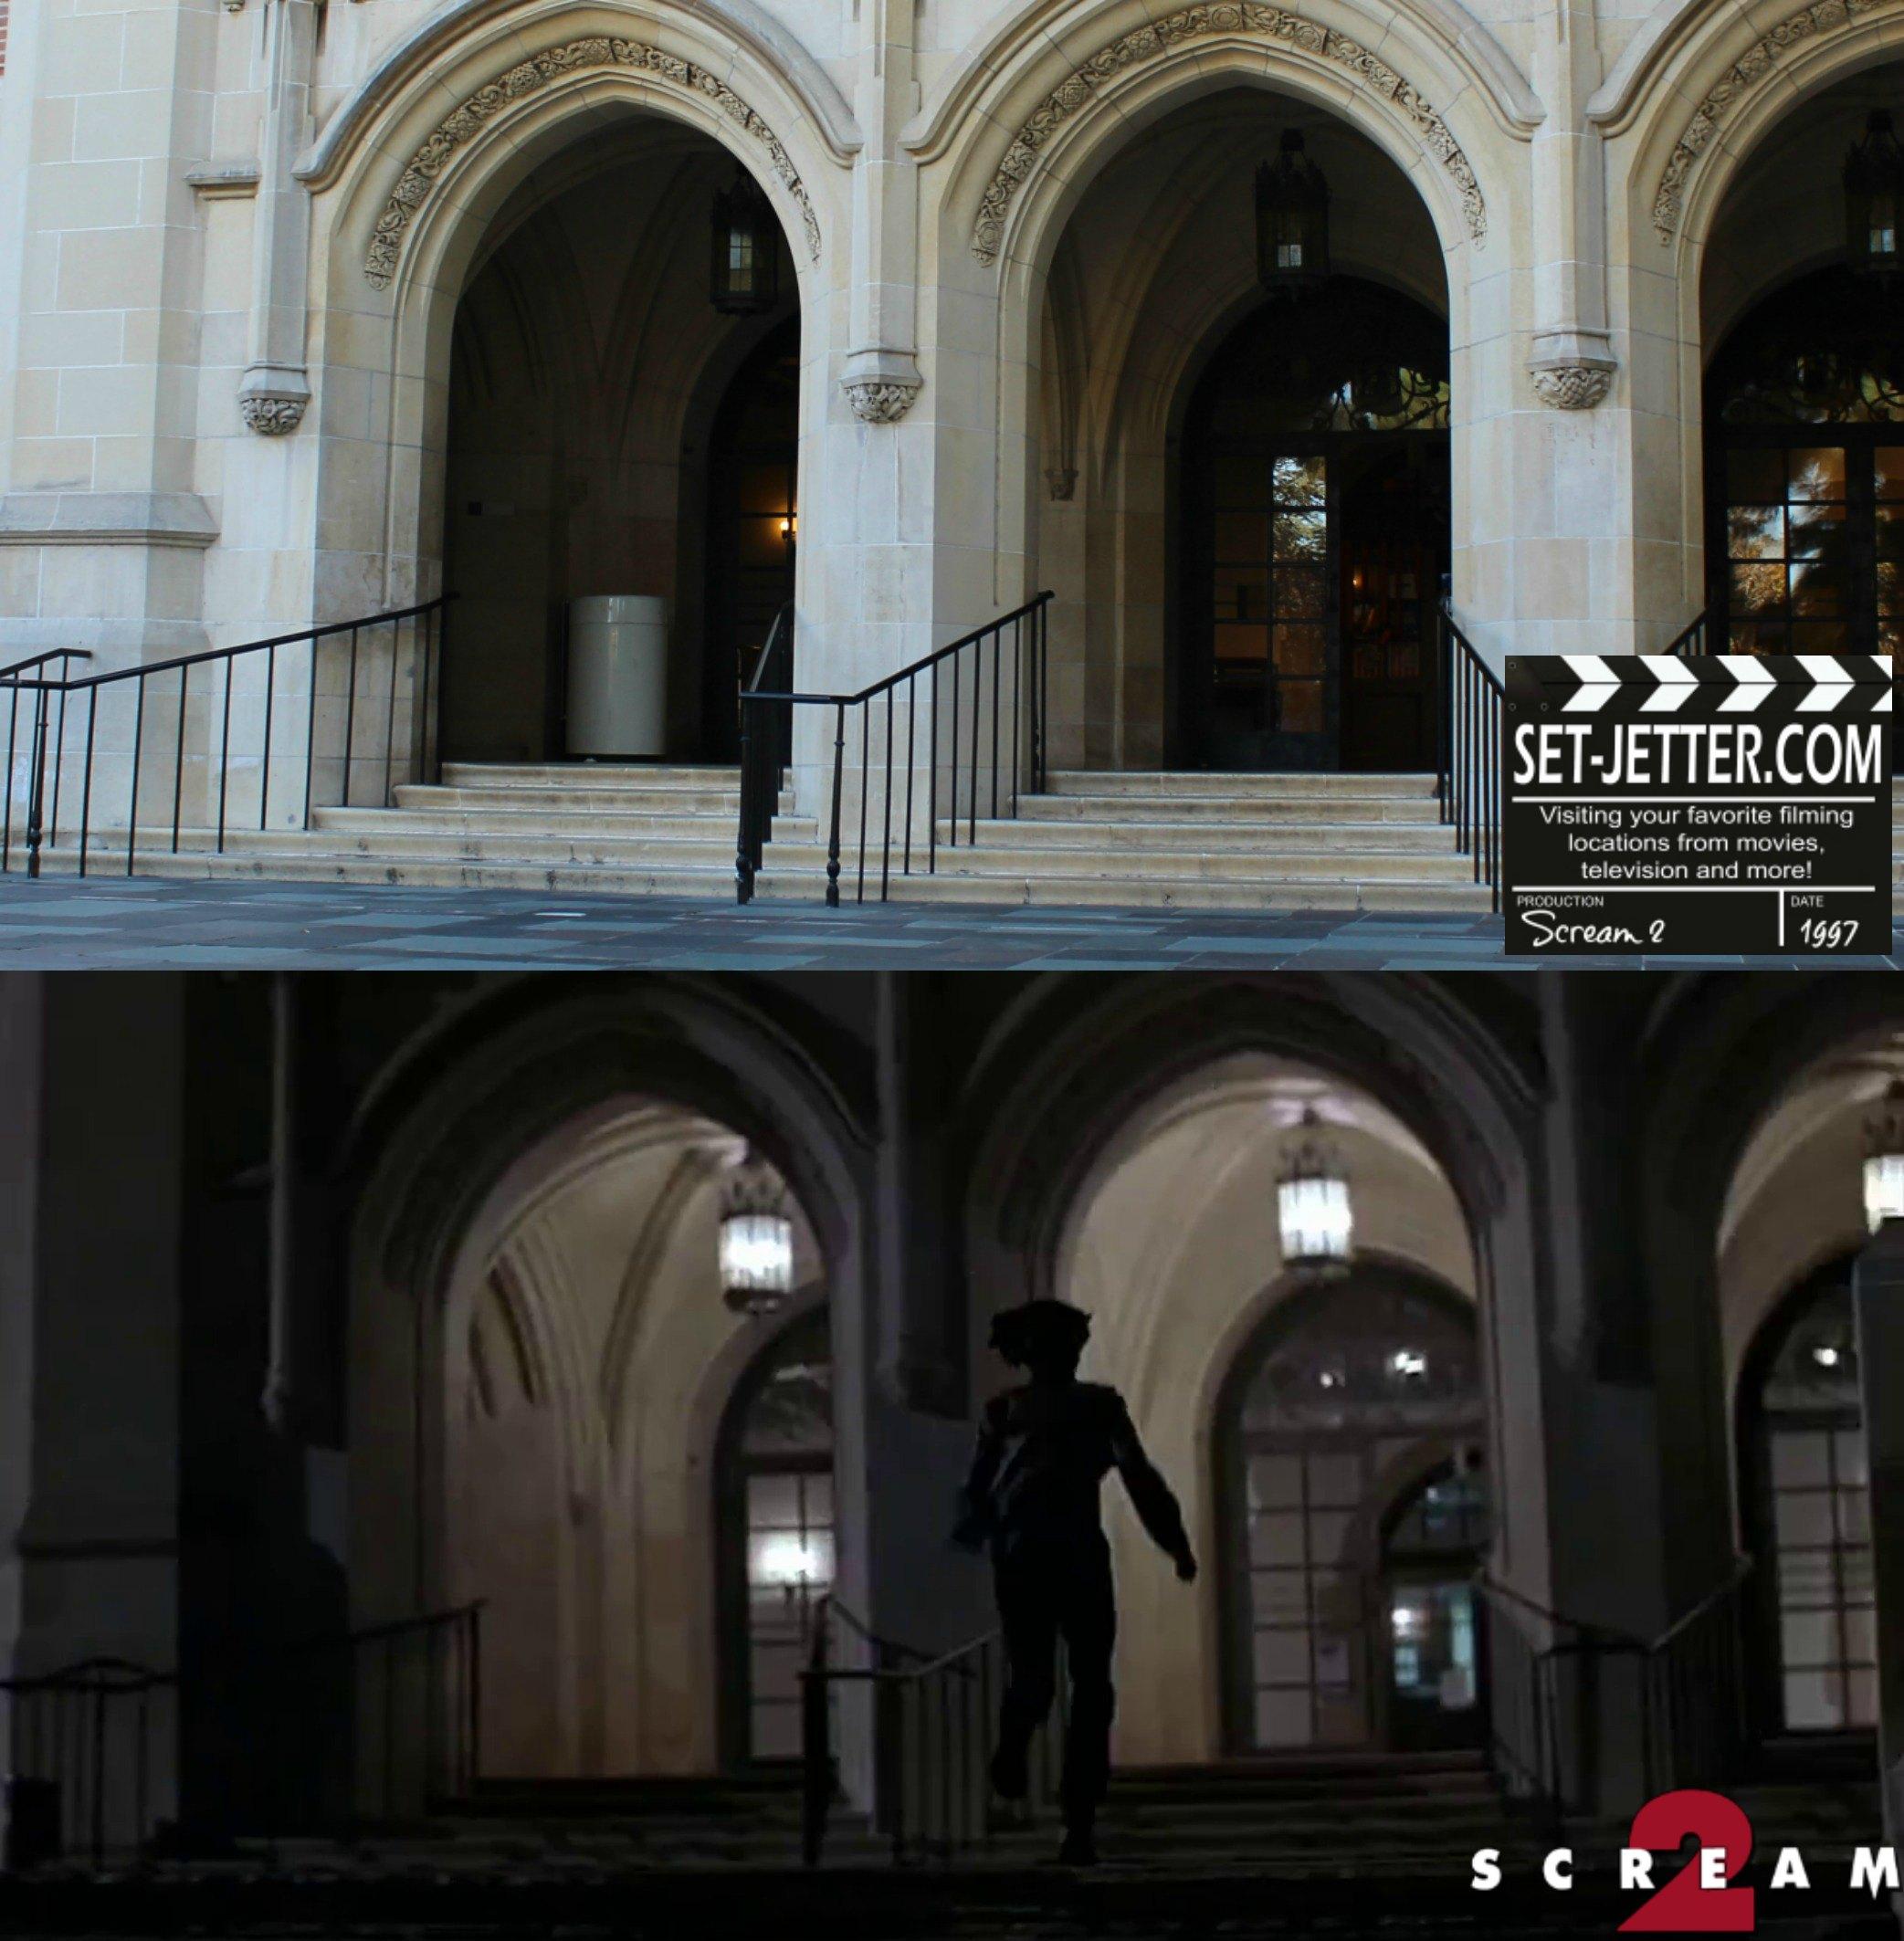 Scream 2 comparison 259.jpg